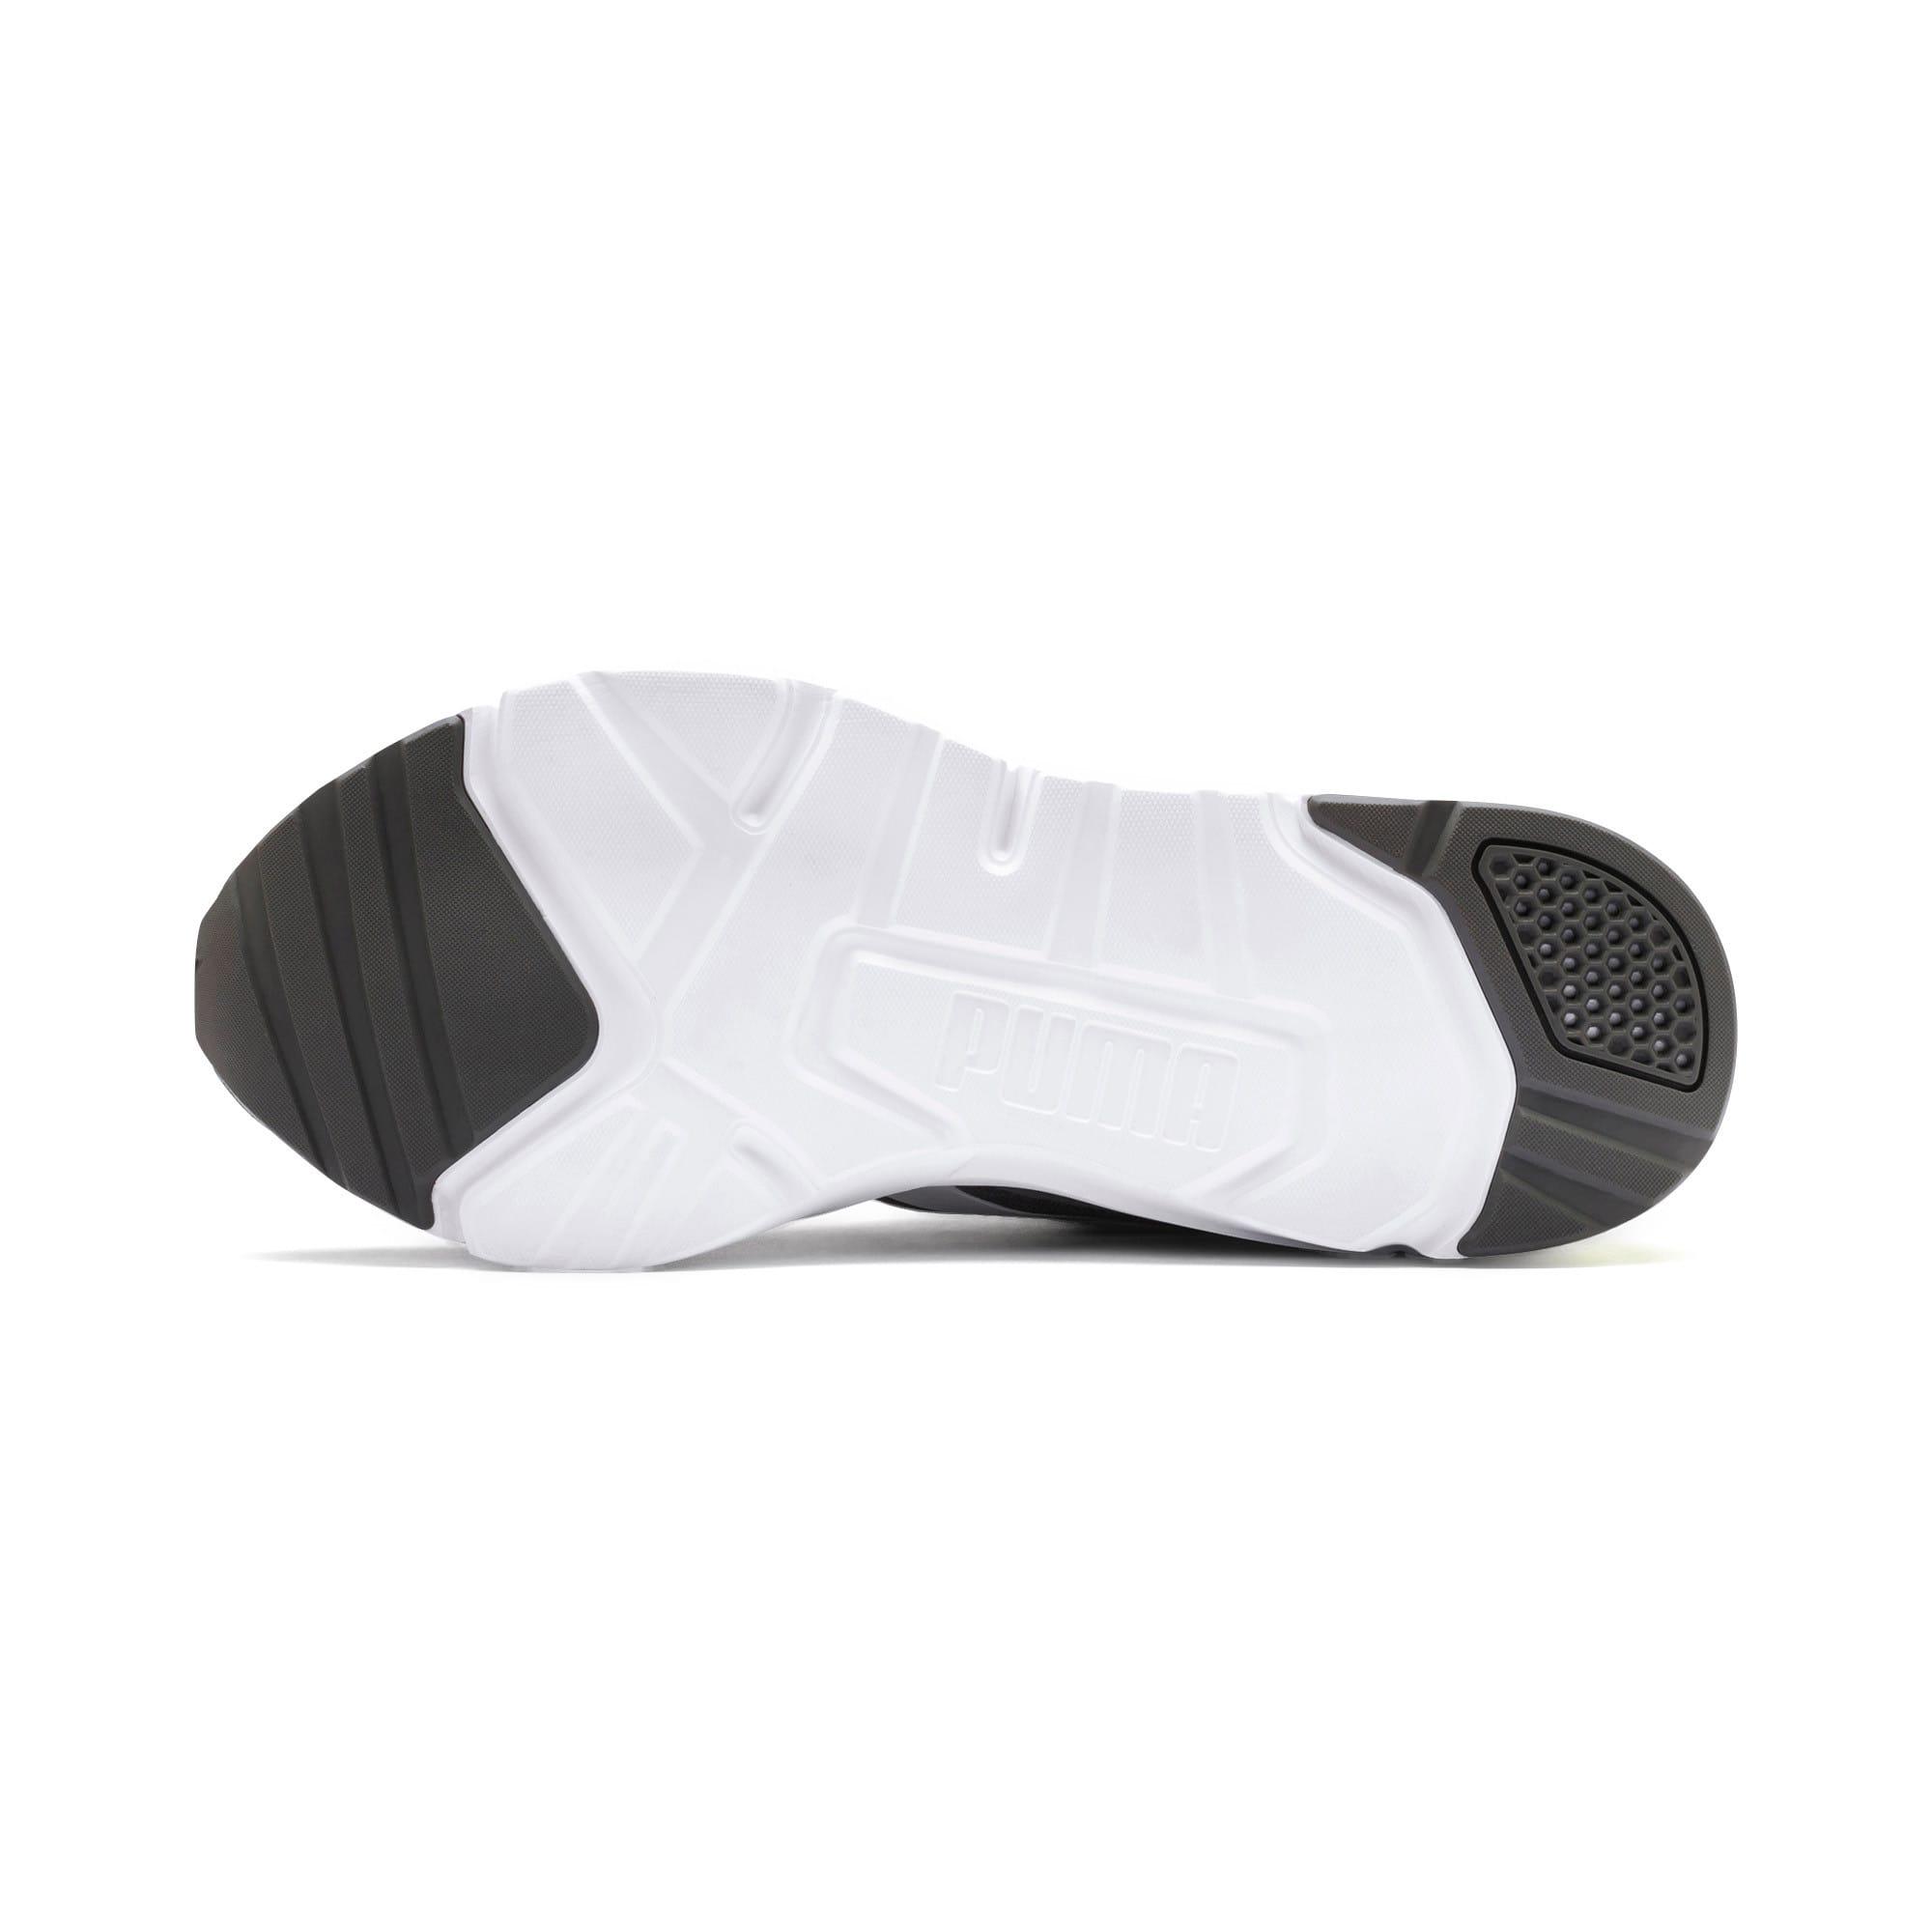 Thumbnail 4 of CELL Phase Lights Men's Training Shoes, CASTLEROCK-Yellow Alert, medium